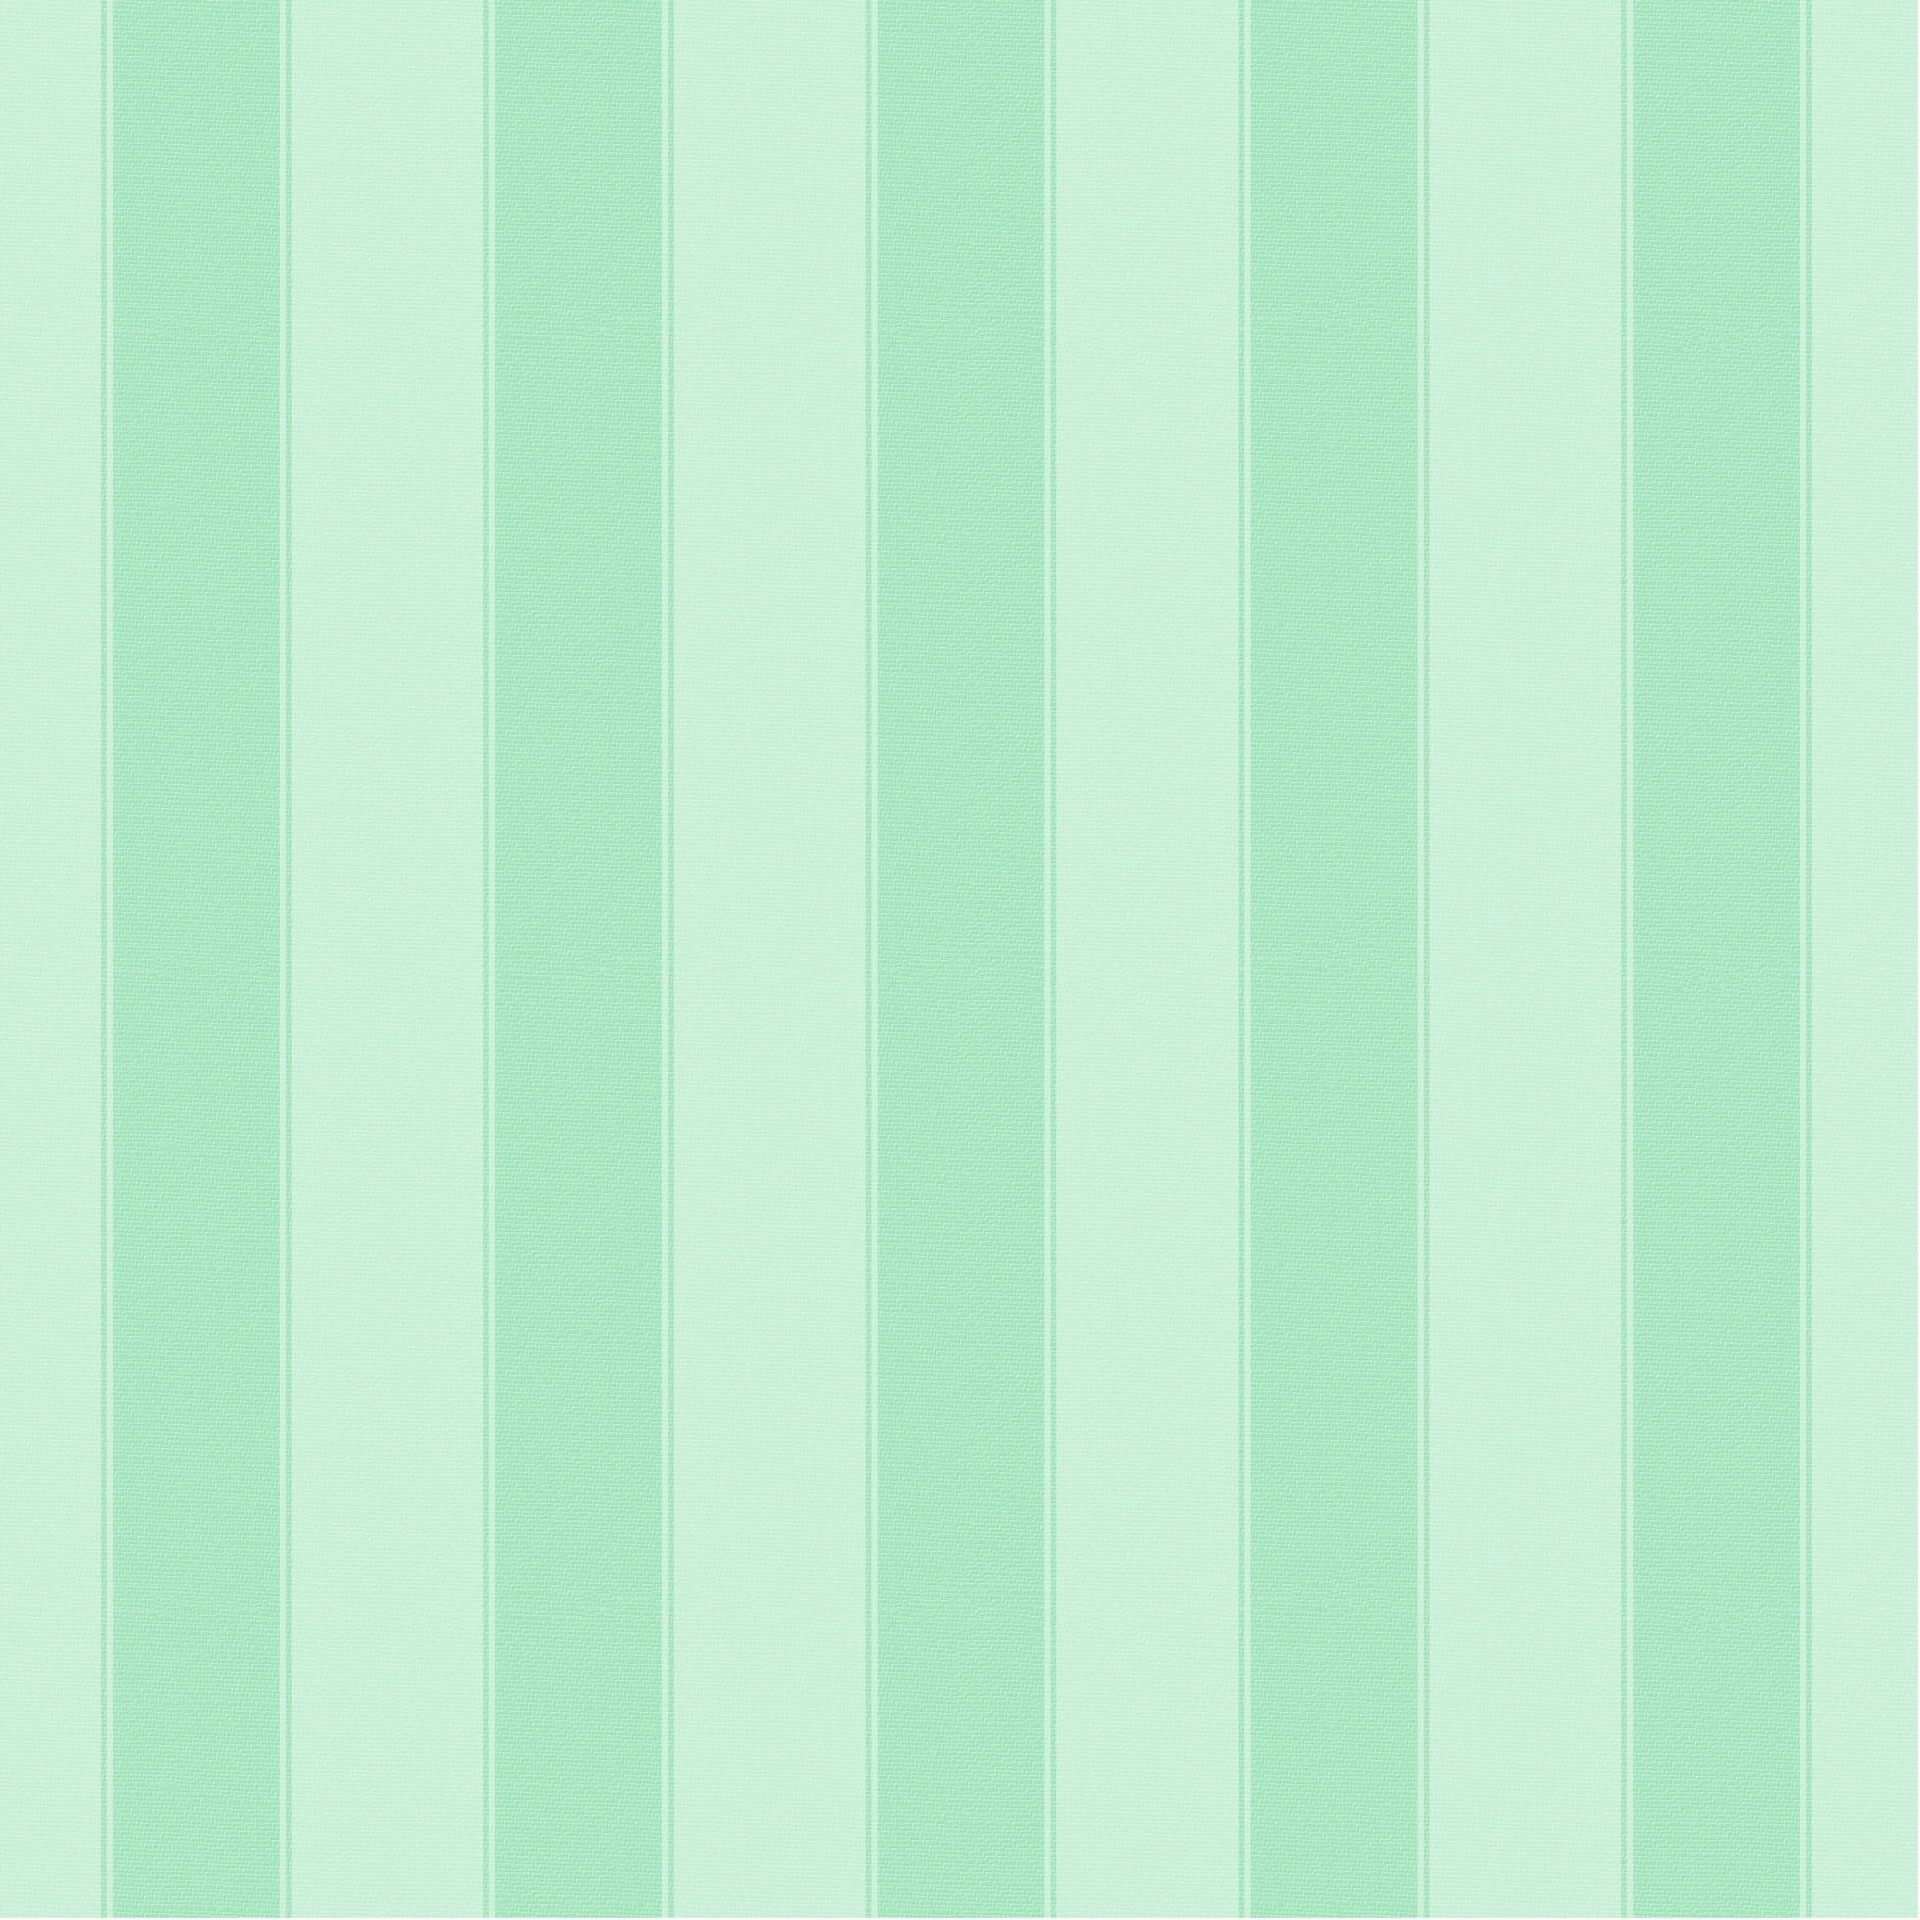 Mint Green Wallpaper Wallpapersafari Powder Room Remodel Custom Drapes And Curtains Bathroom Make Overs Pastel Color